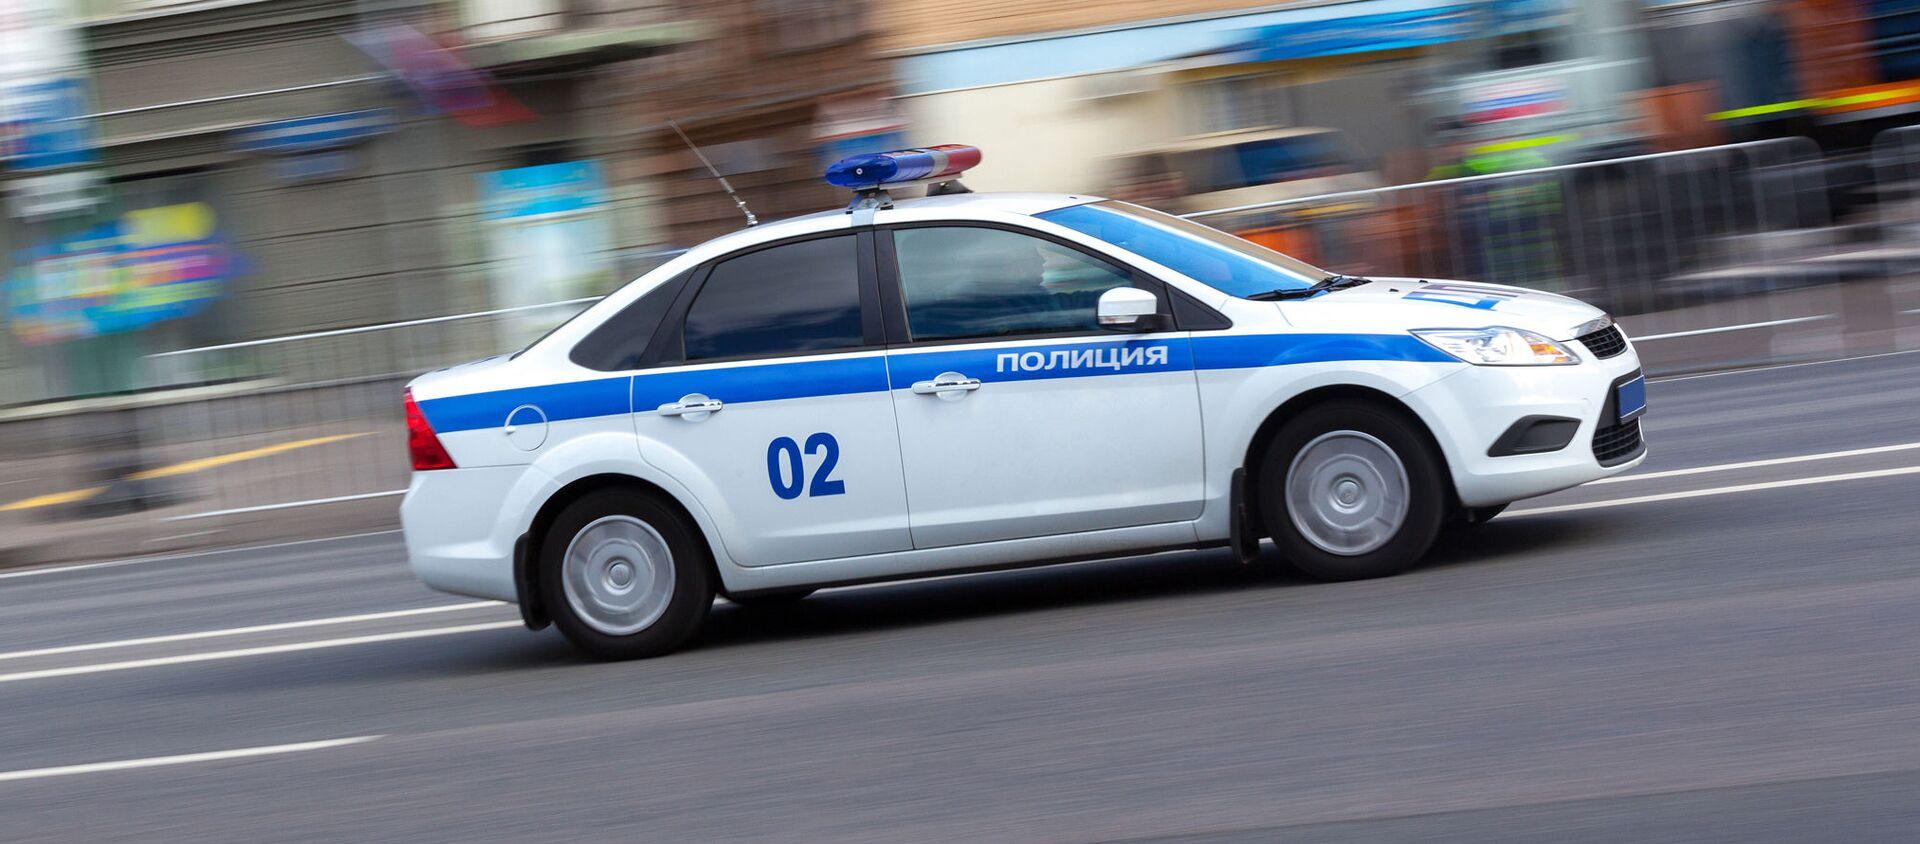 Rosyjska policja - Sputnik Polska, 1920, 01.06.2021